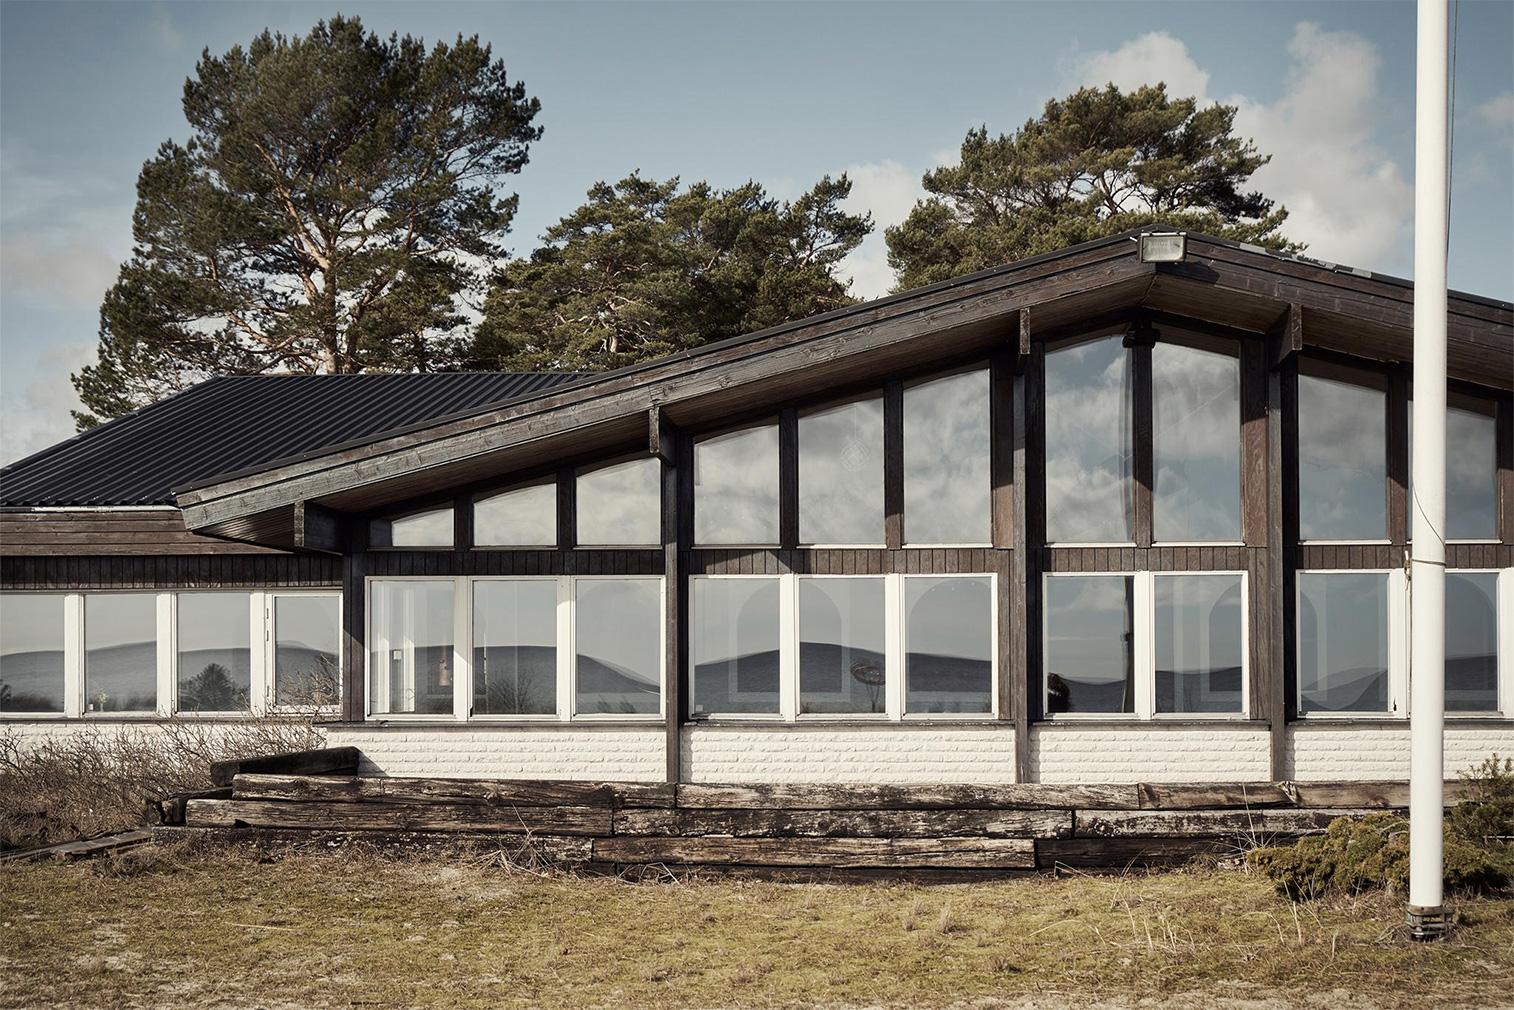 Historic 1930s beach resort for sale in Sweden's Skåne via Fantastic Frank